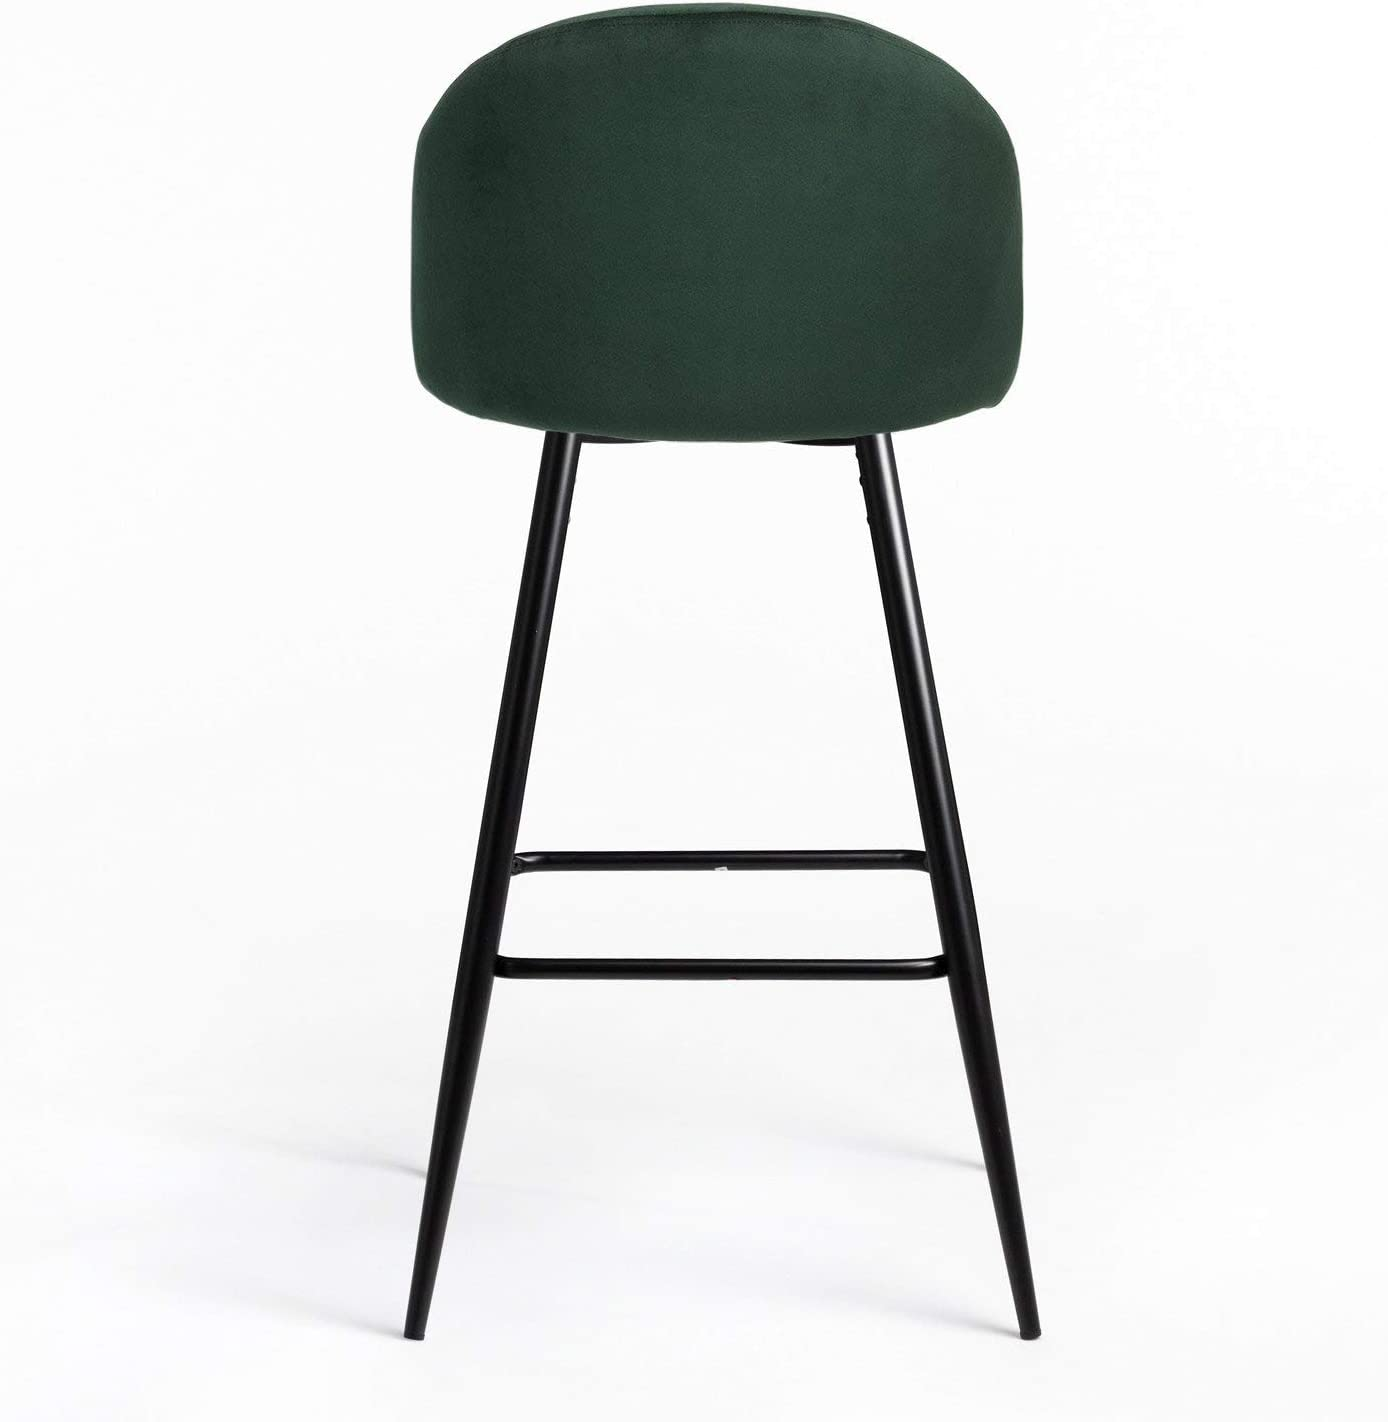 SKLUM Taburete Alto en Terciopelo Kana Terciopelo Negro Verde Jungla Elige Color